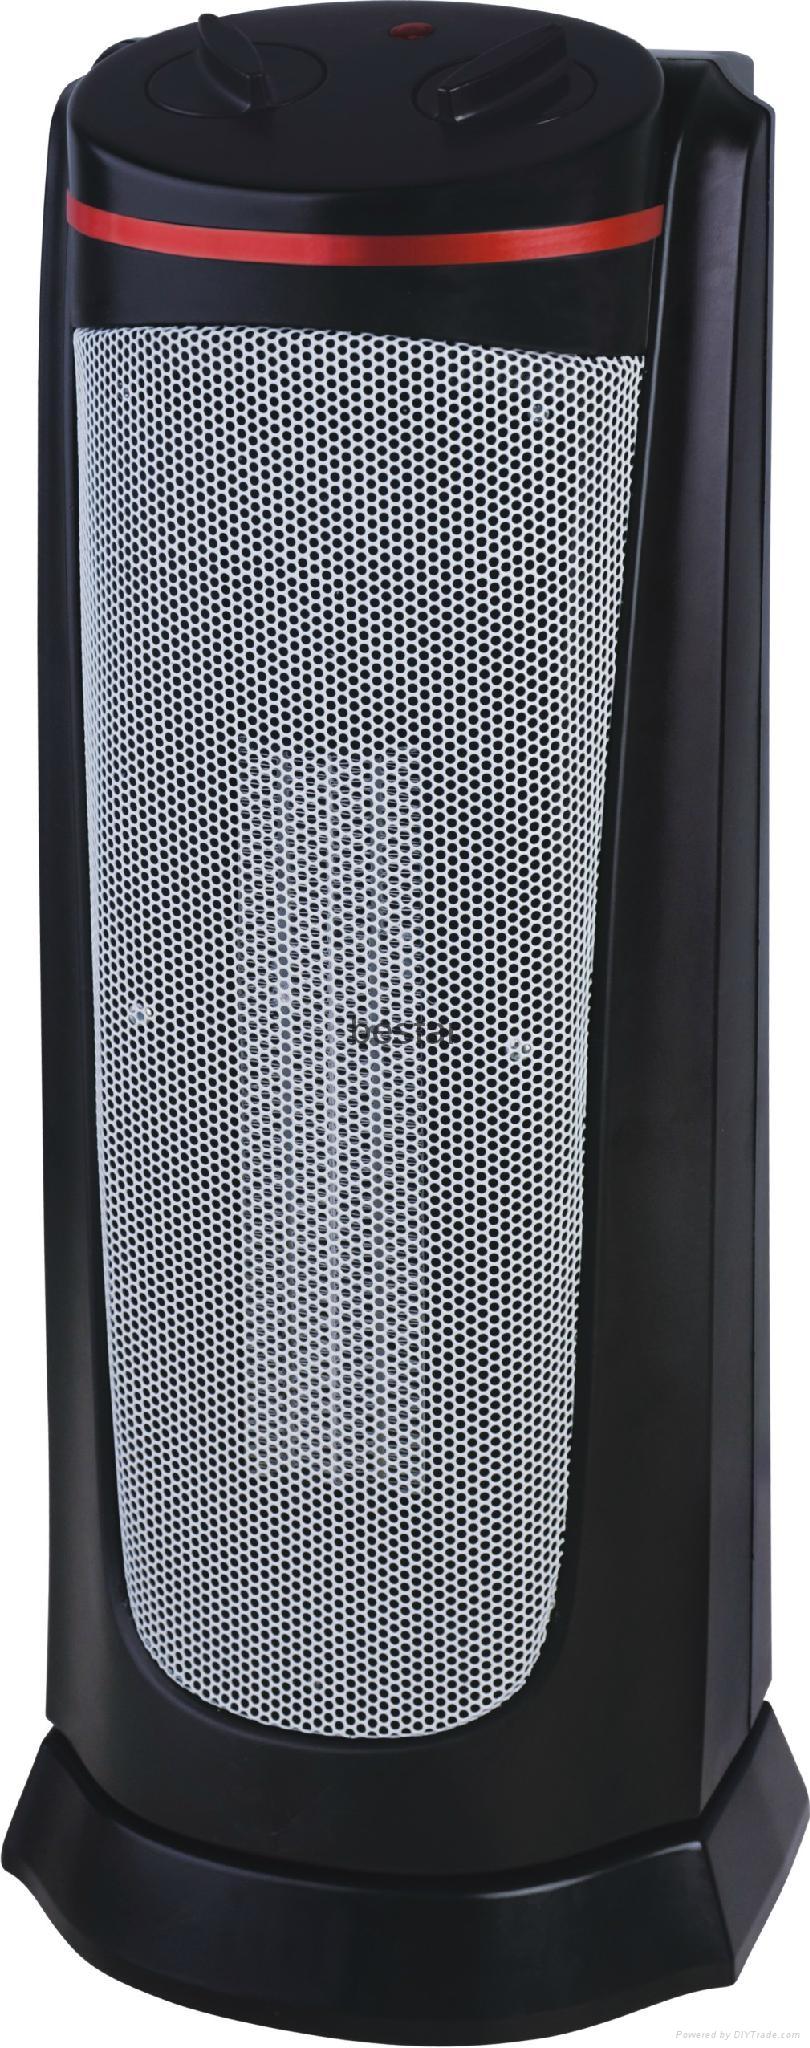 Oscillating Ceramic Tower Heater 2